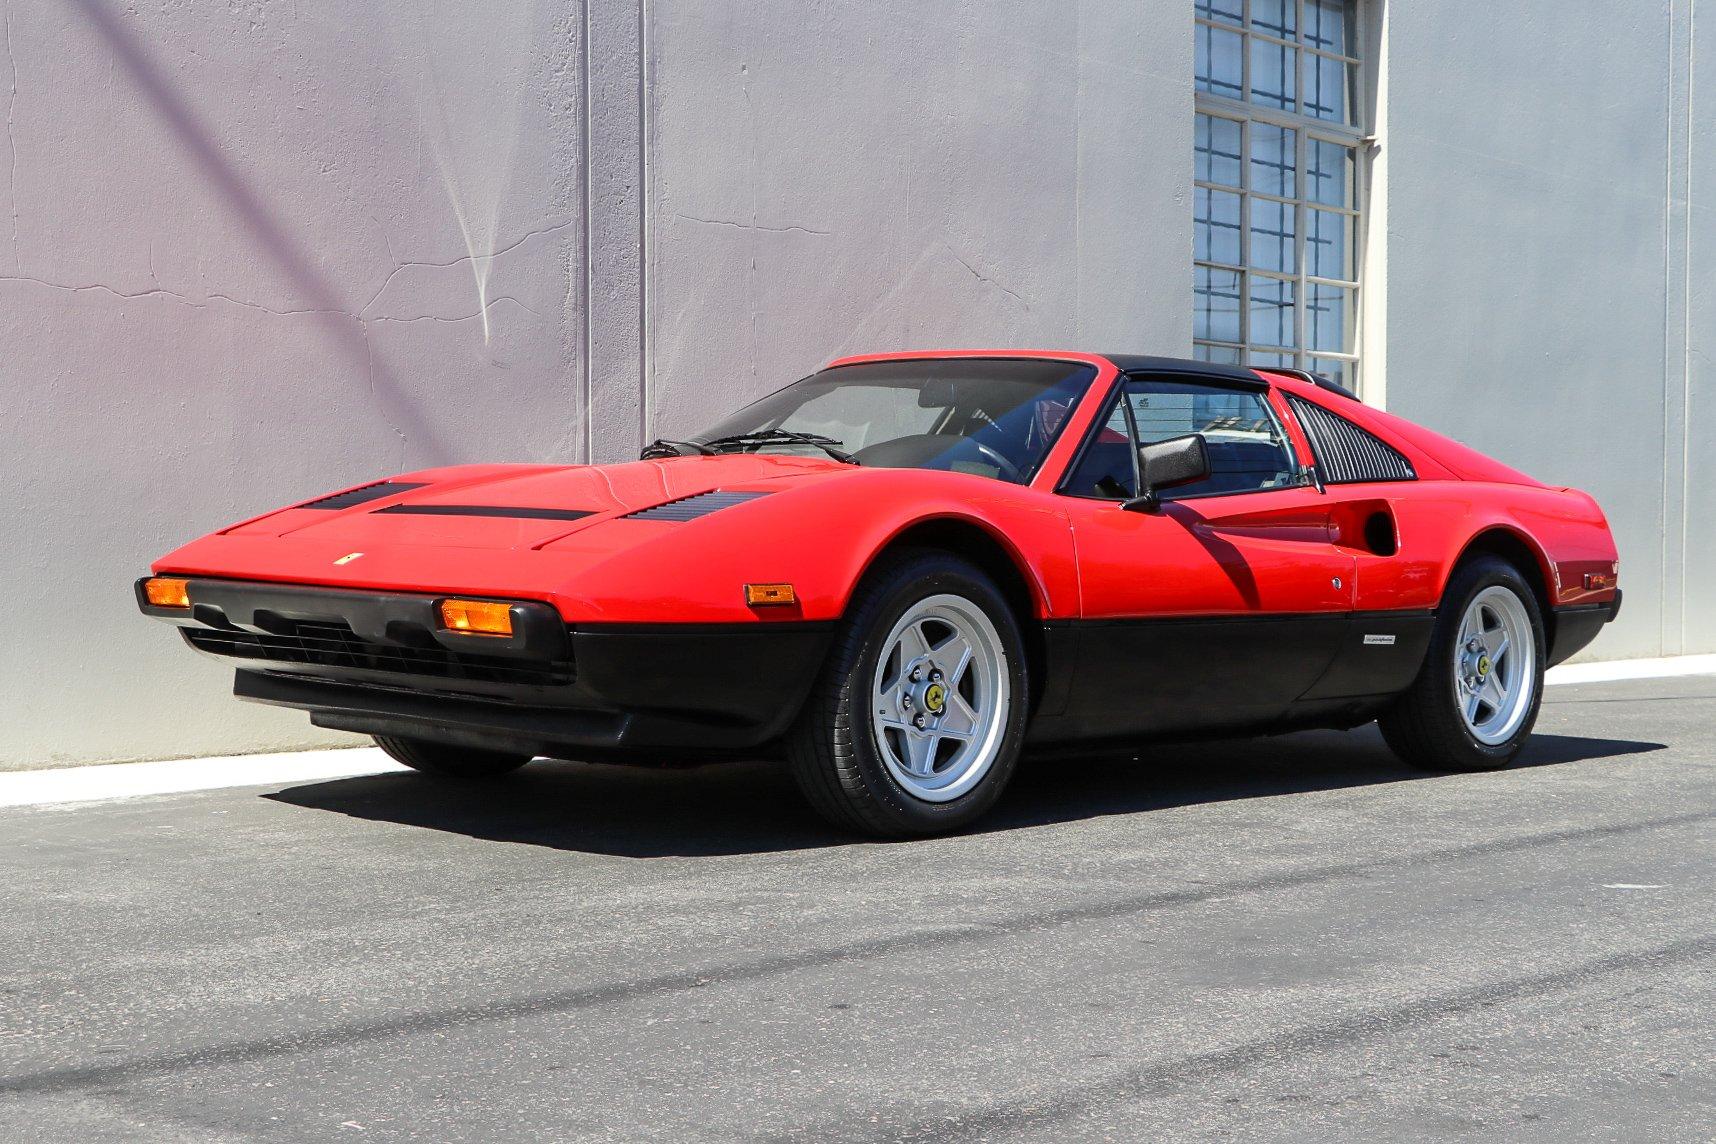 Ferrari 308 Gts For Sale >> 1985 Ferrari 308 Gts For Sale 169652 Motorious